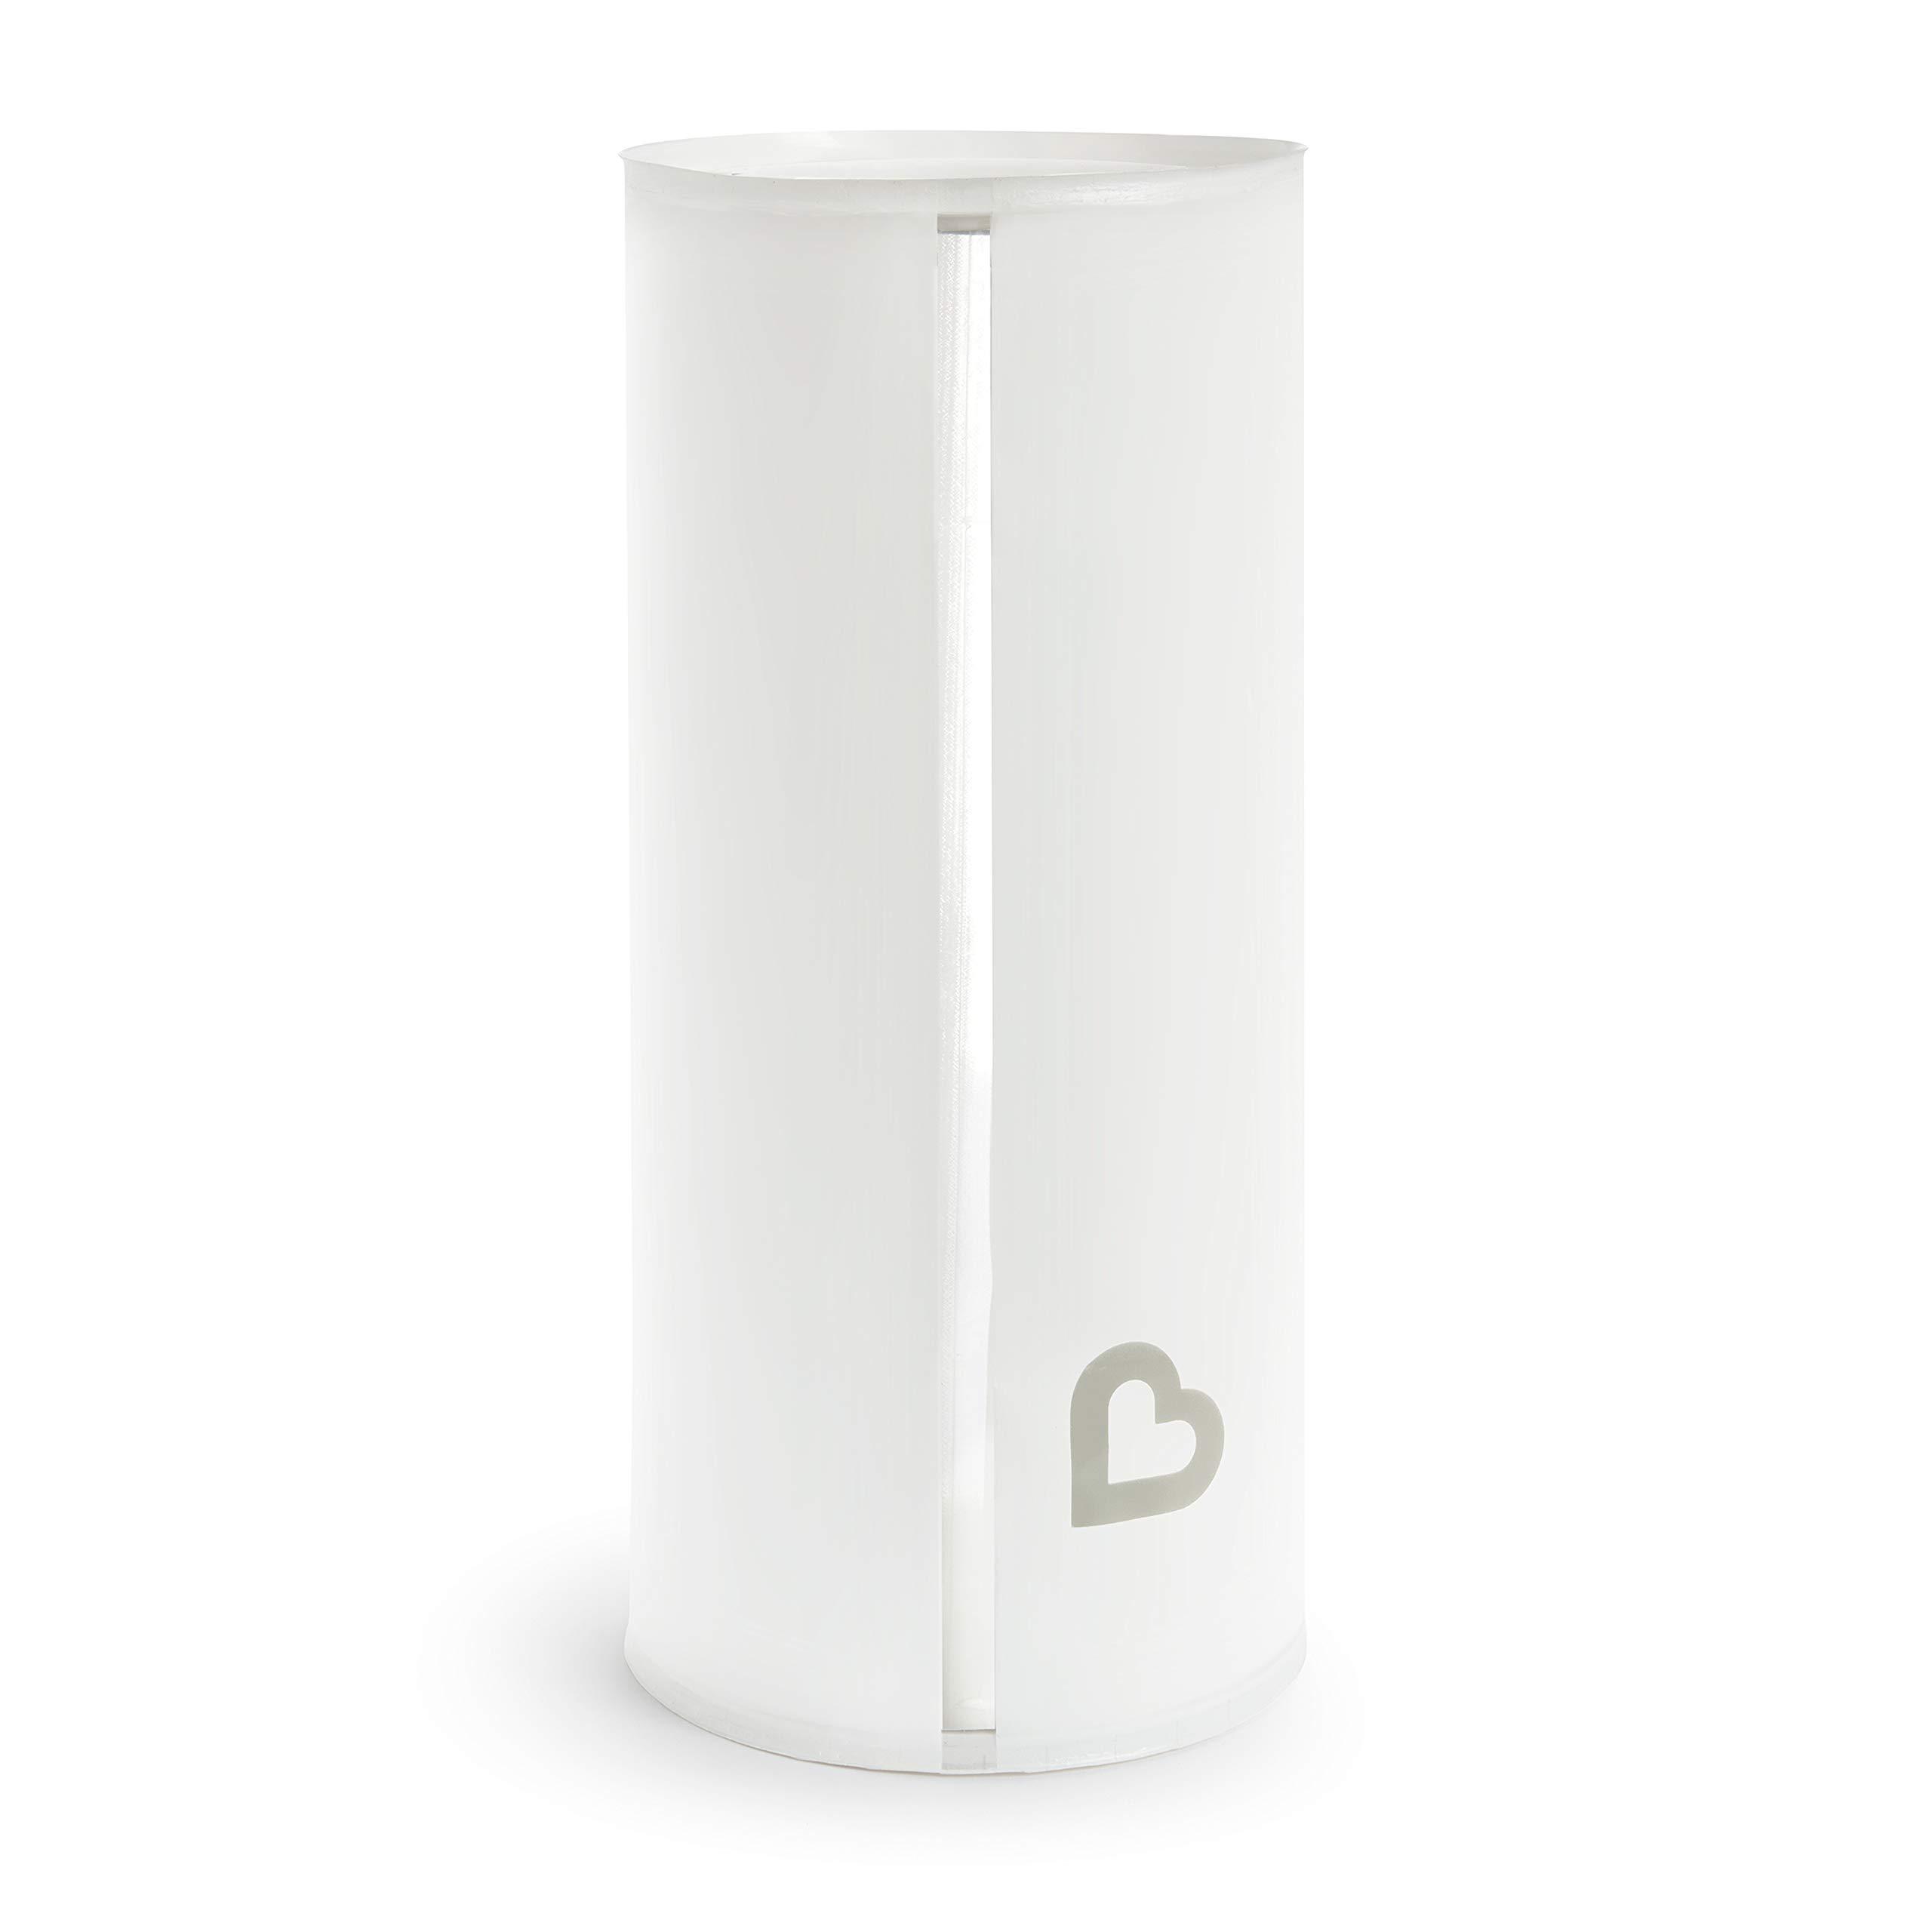 Munchkin Toss Portable Disposable Diaper Pail